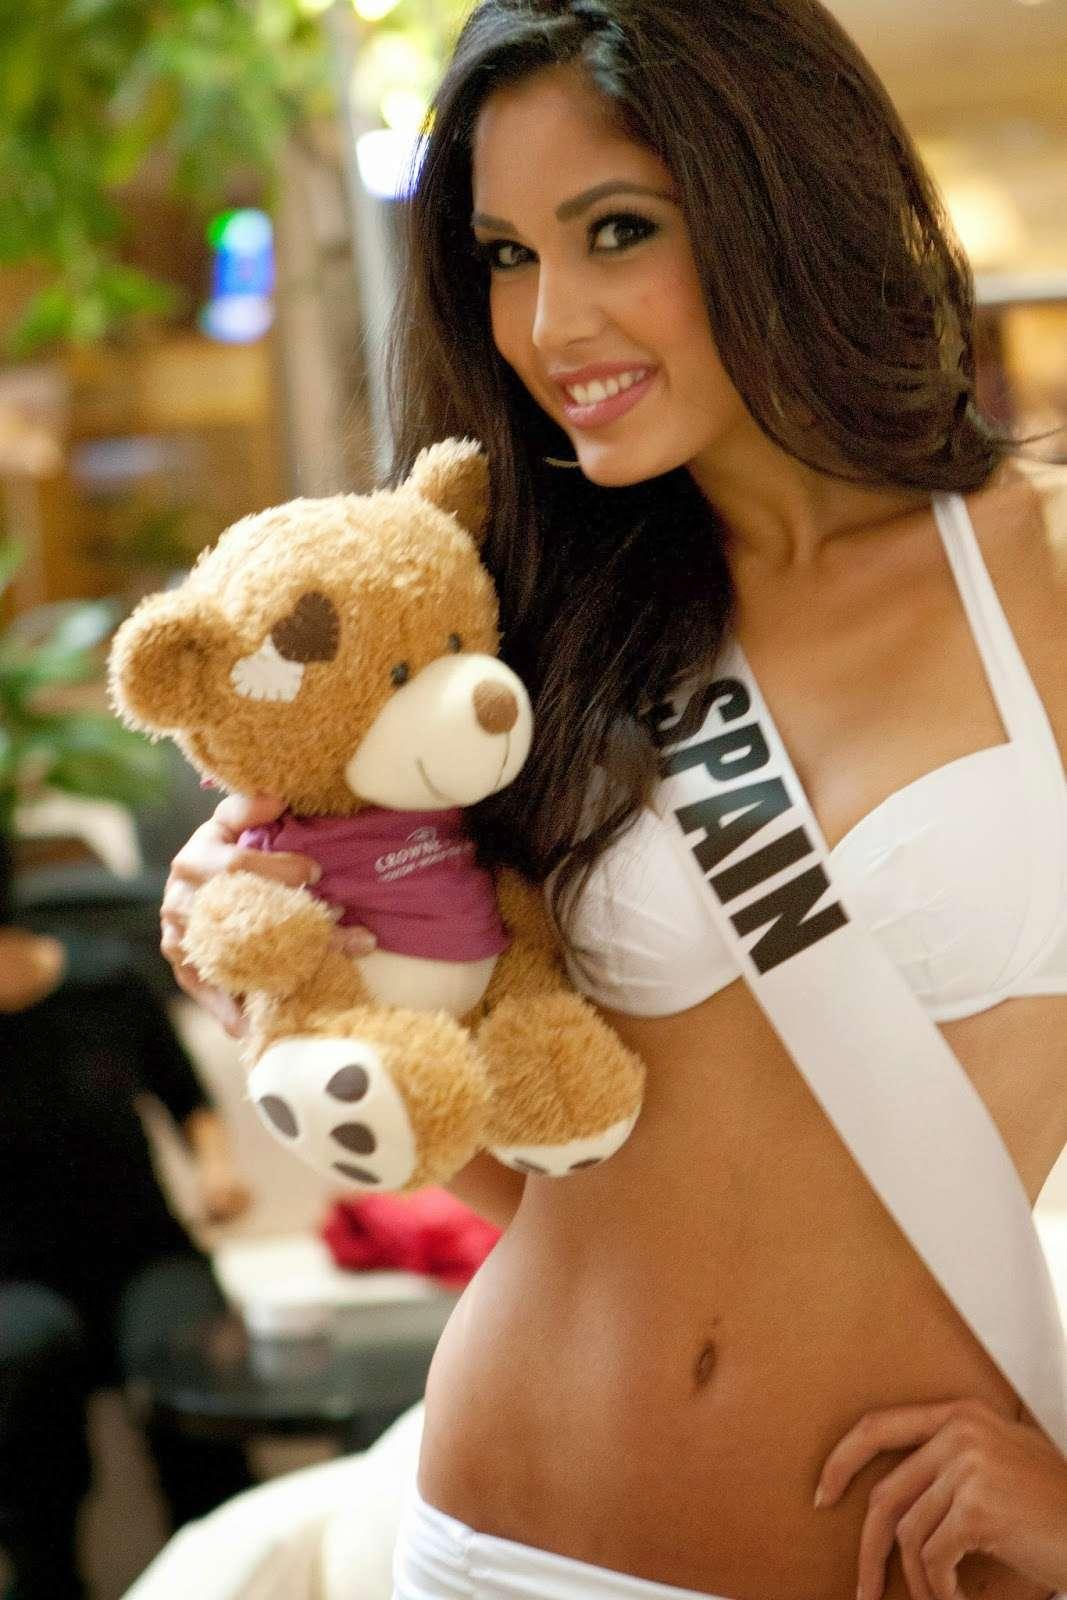 patricia yurena rodriguez, miss espana 2008/2013, 1st runner-up de miss universe 2013. - Página 5 Uni20111